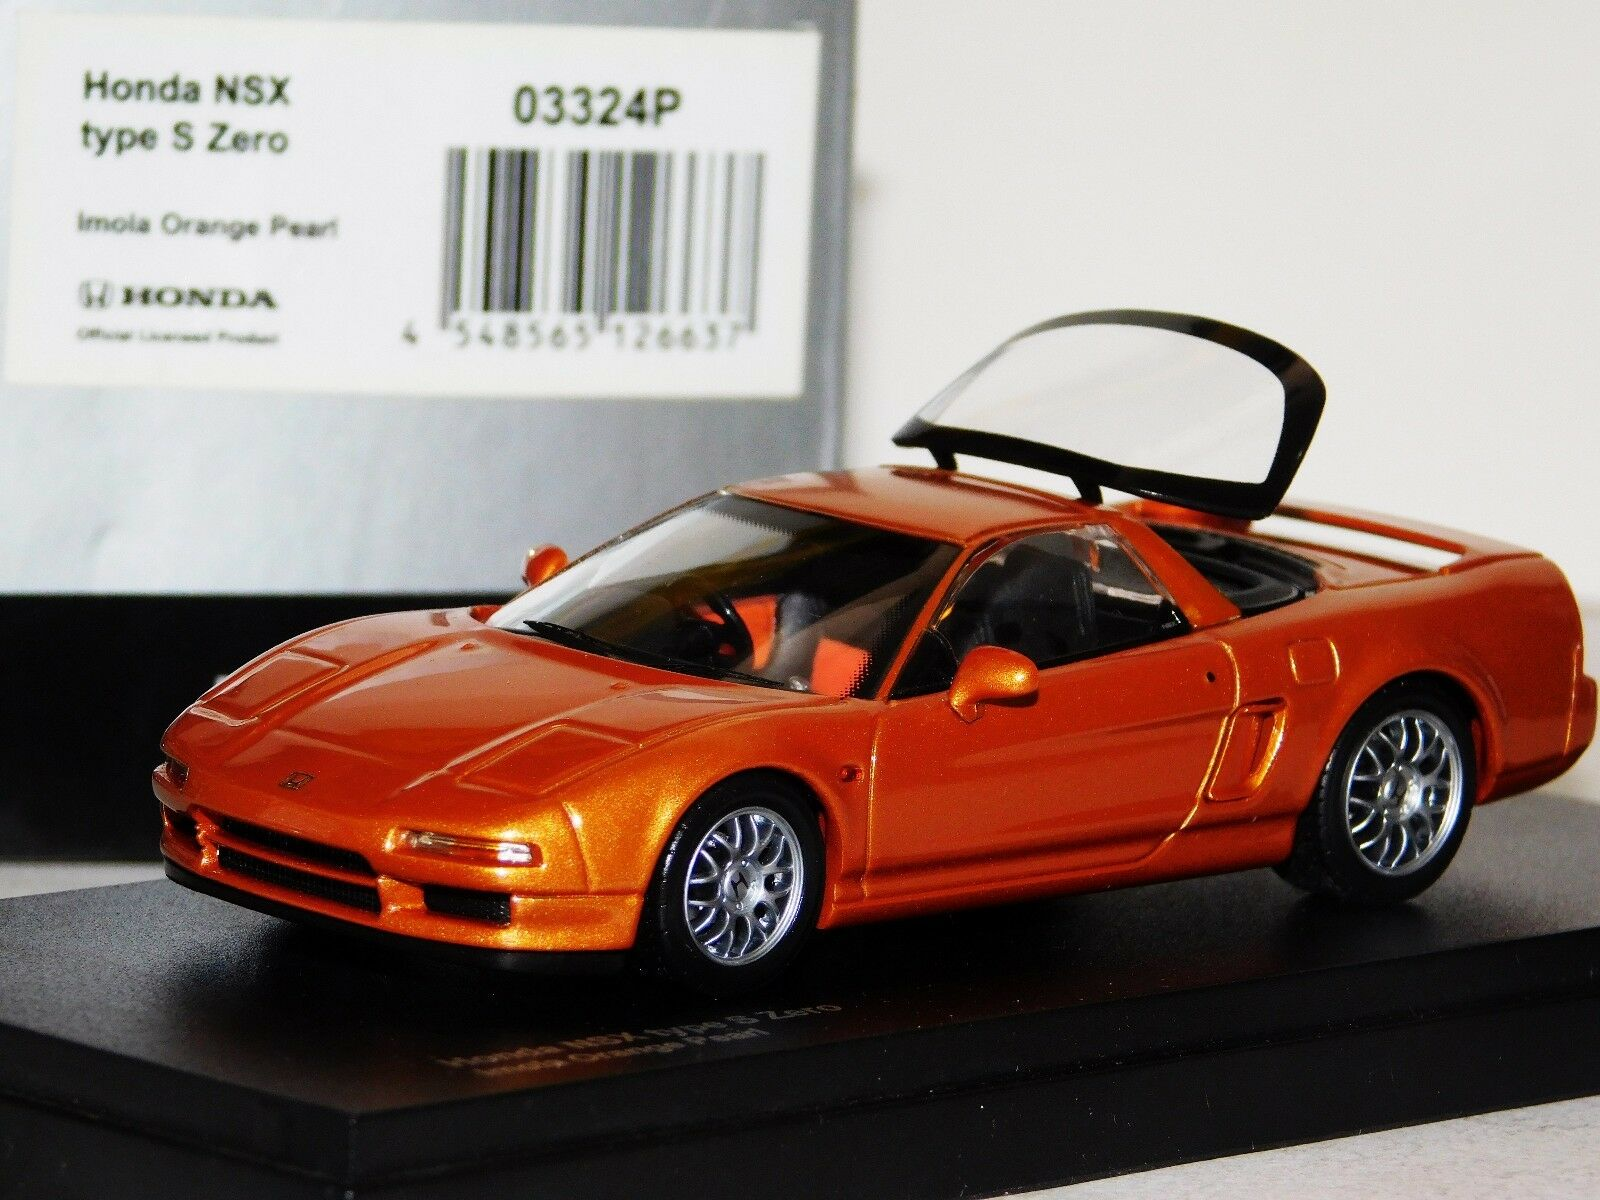 HONDA NSX TYPE S ZERO IMOLA arancia PEARL OPENING REAR WINDOW KYOSHO 03324P 1:43